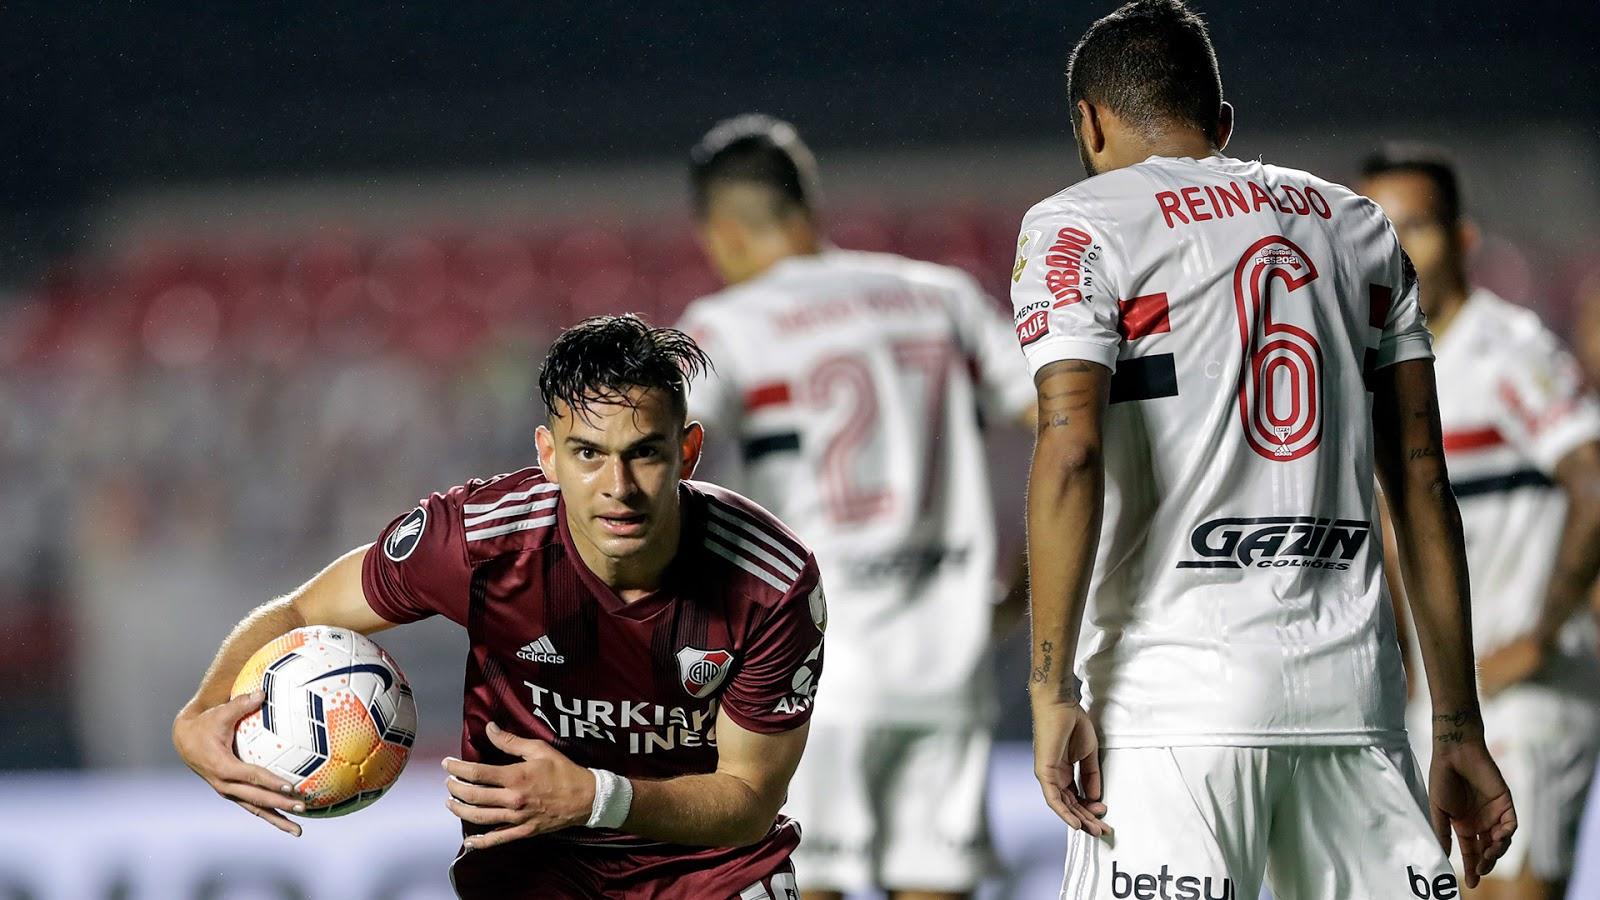 Copa Libertadores: Sao Paulo vs River Plate